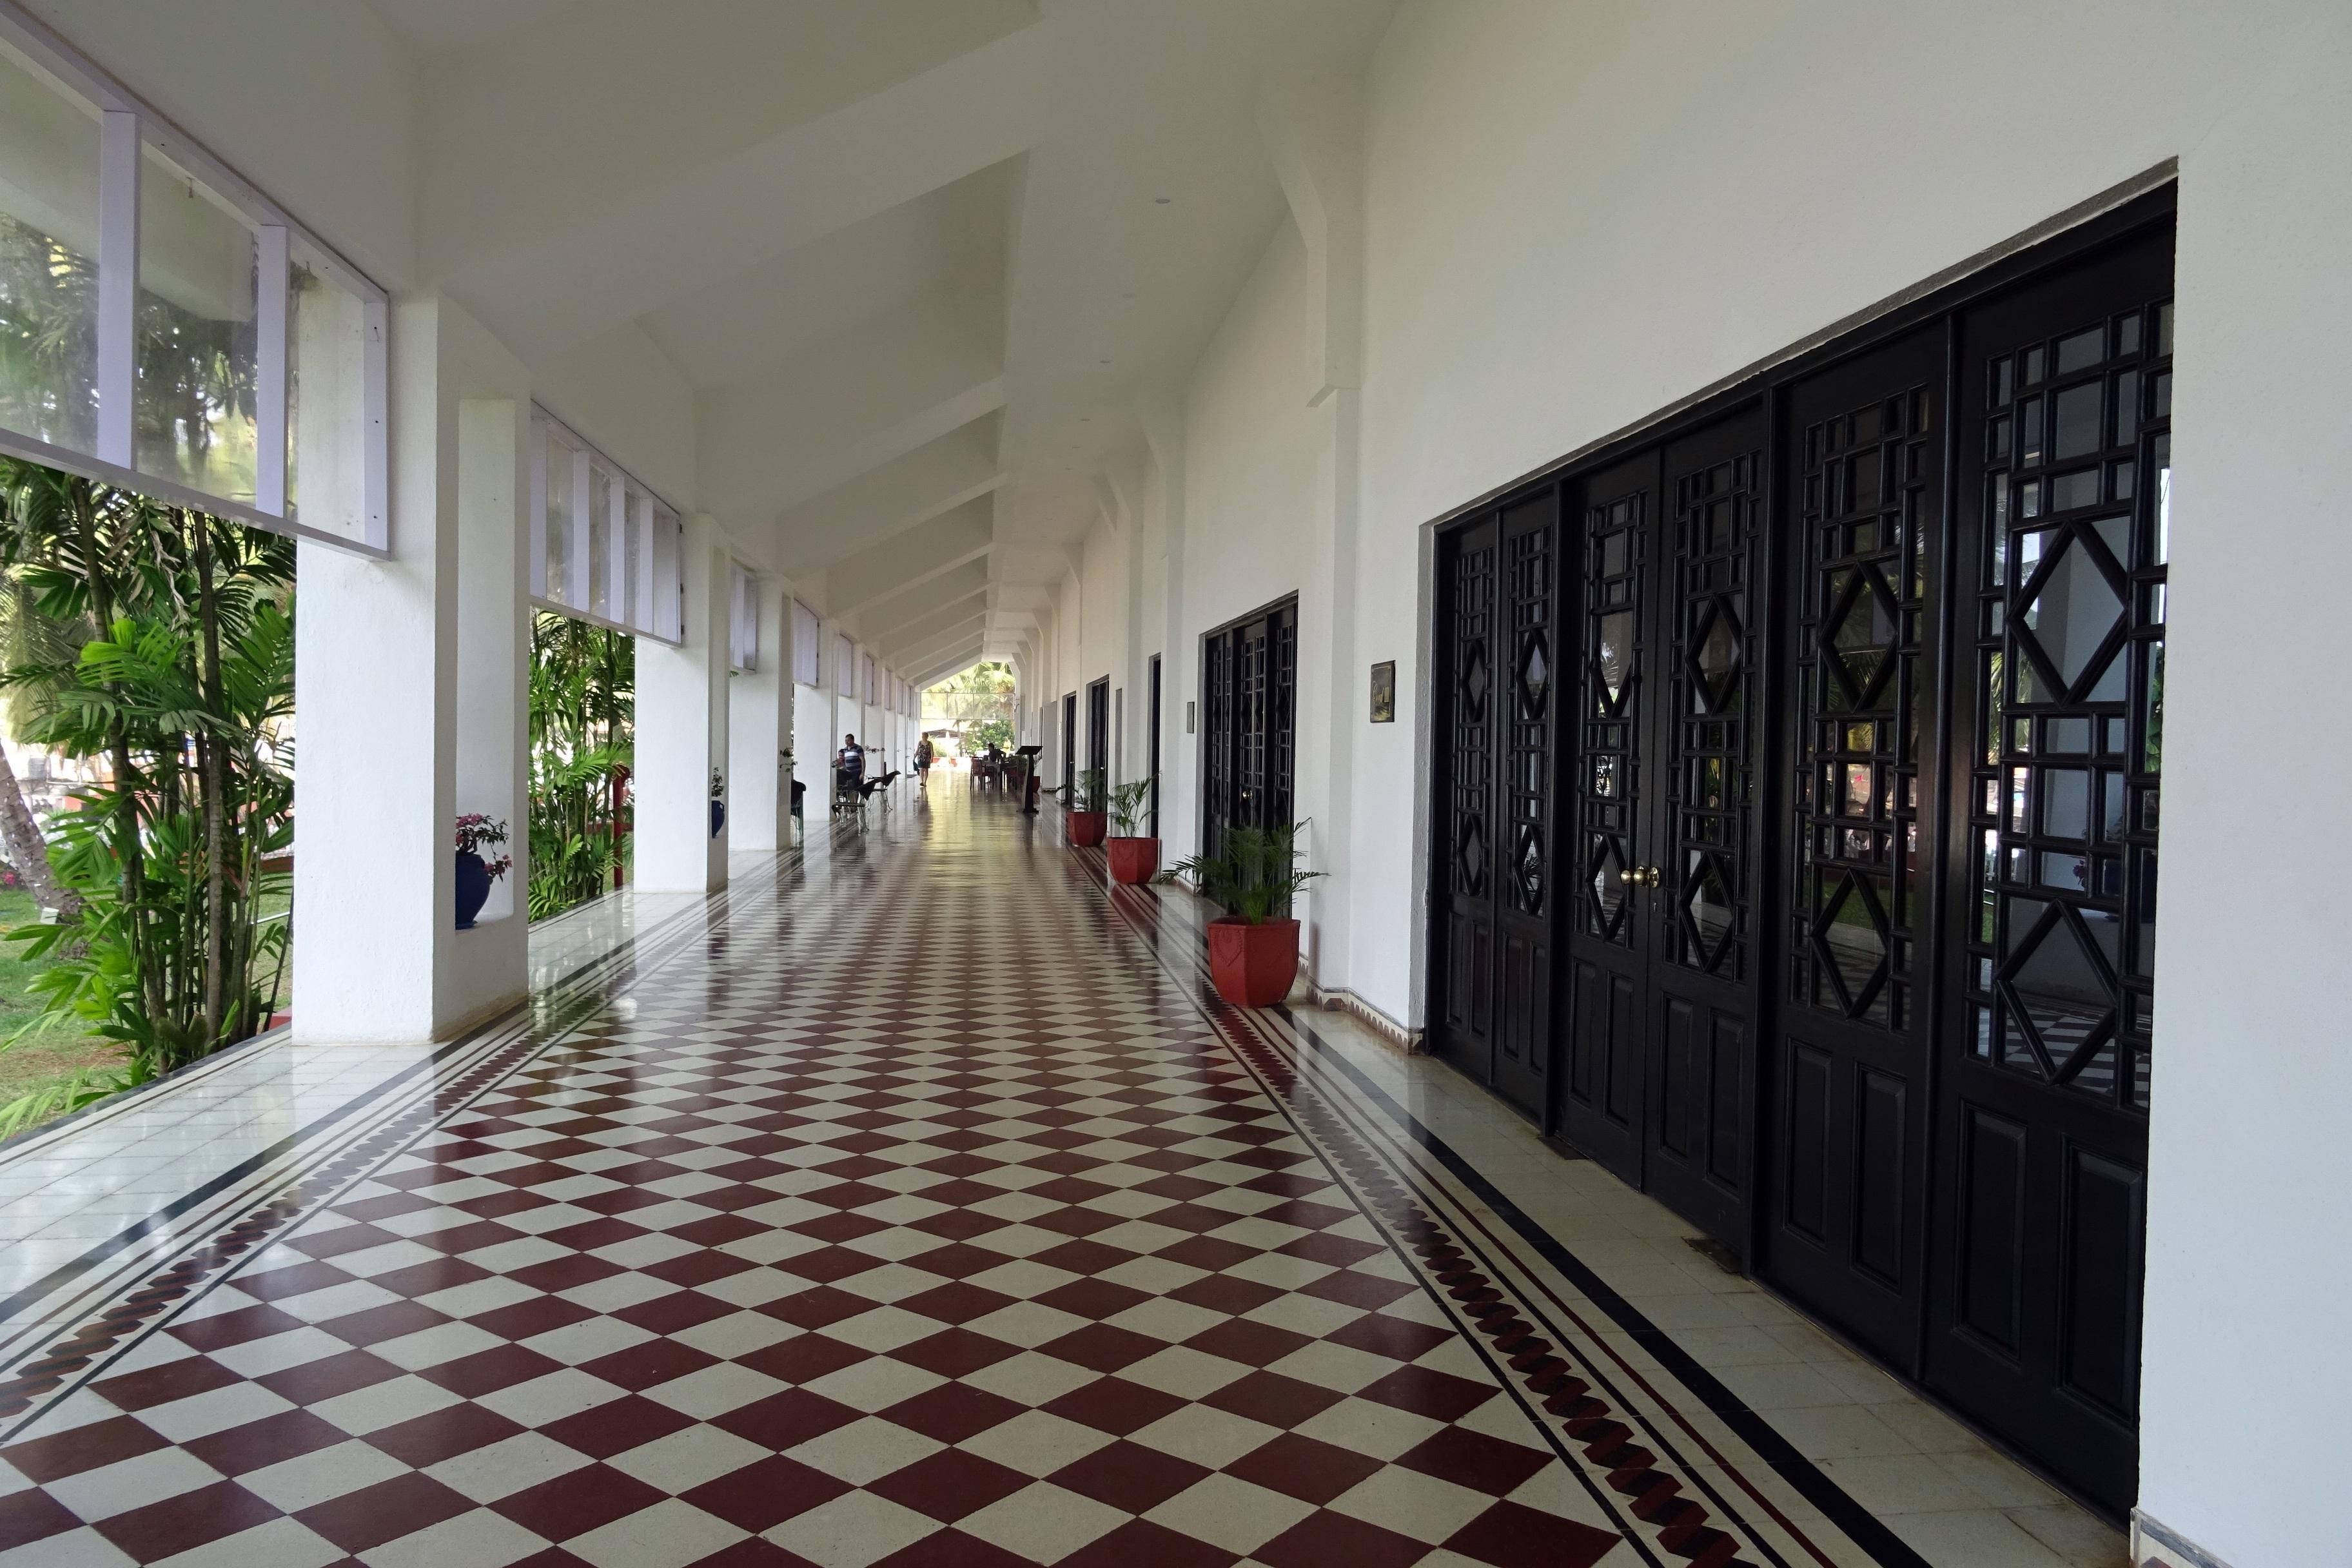 Fotos gratis arquitectura palacio piso interior for Diseno de interiores formacion profesional